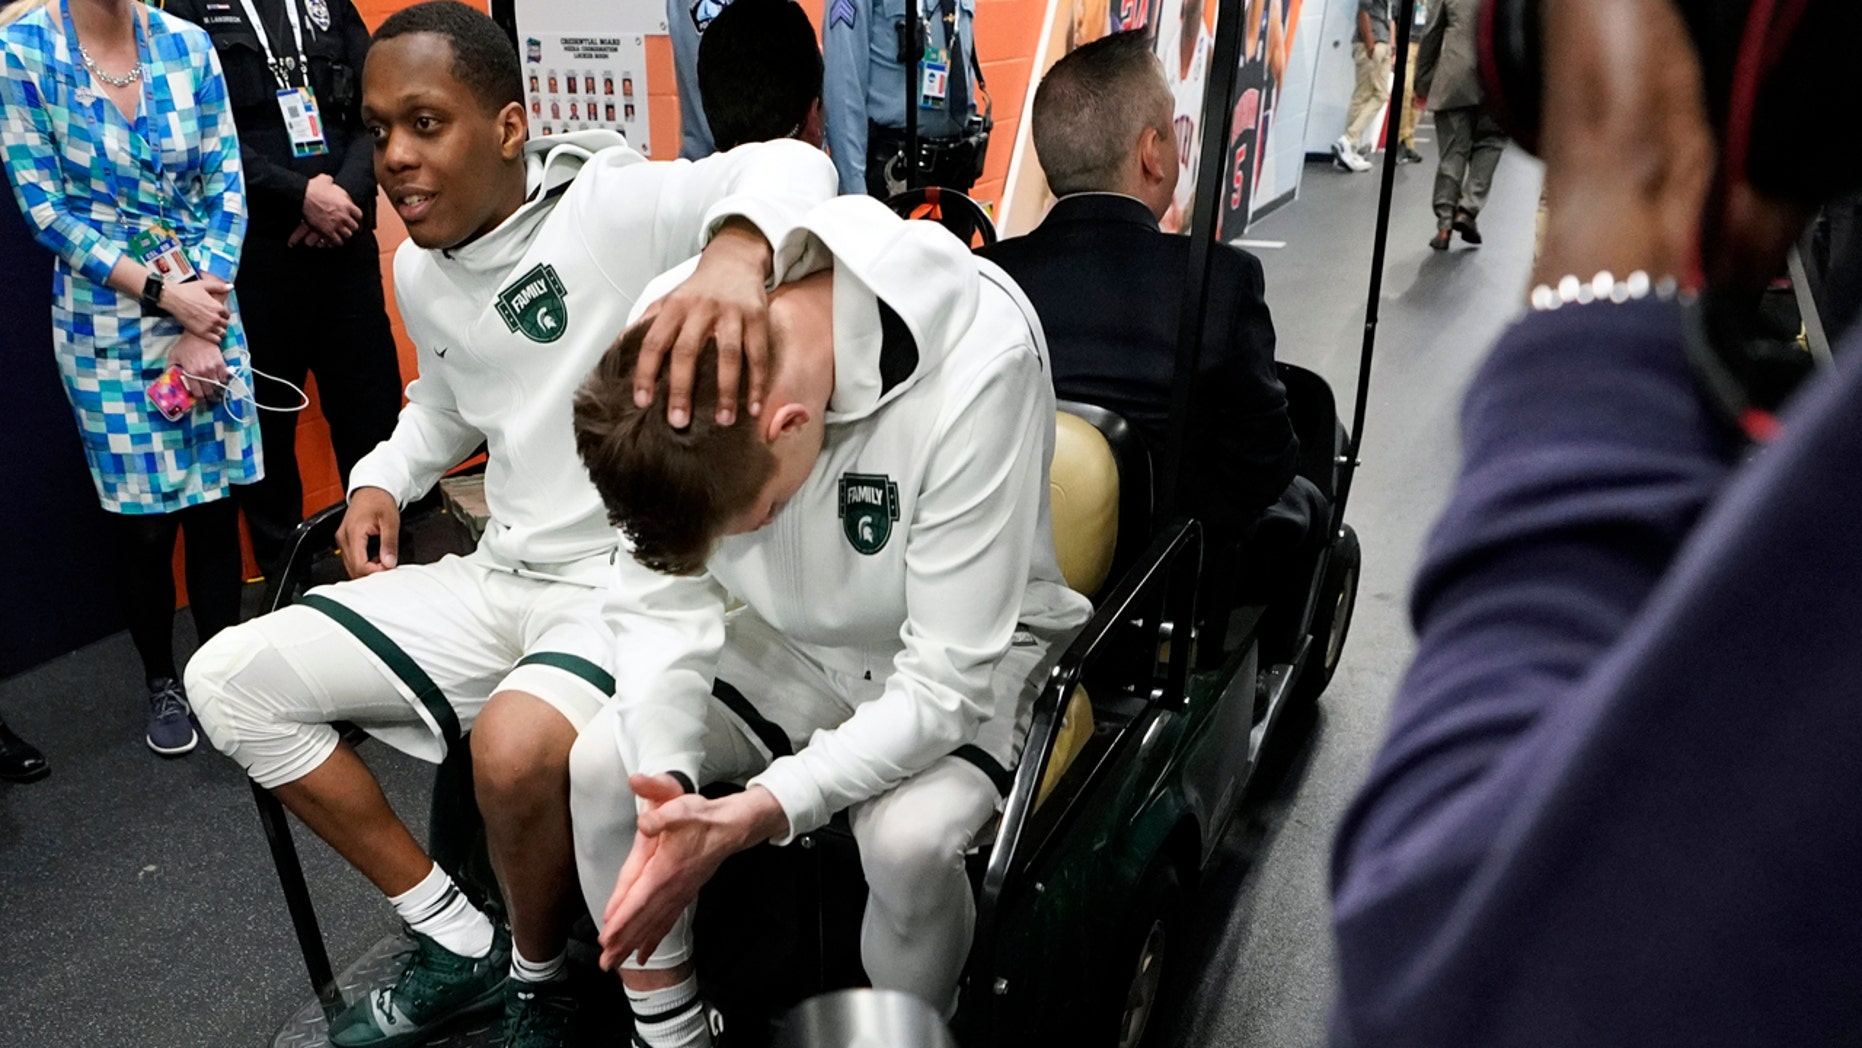 Cassius Winston, Michigan, left, and Matt McQuade reacted after losing 61-51 teams from Texas Tech. (AP Photo / David J. Phillip)